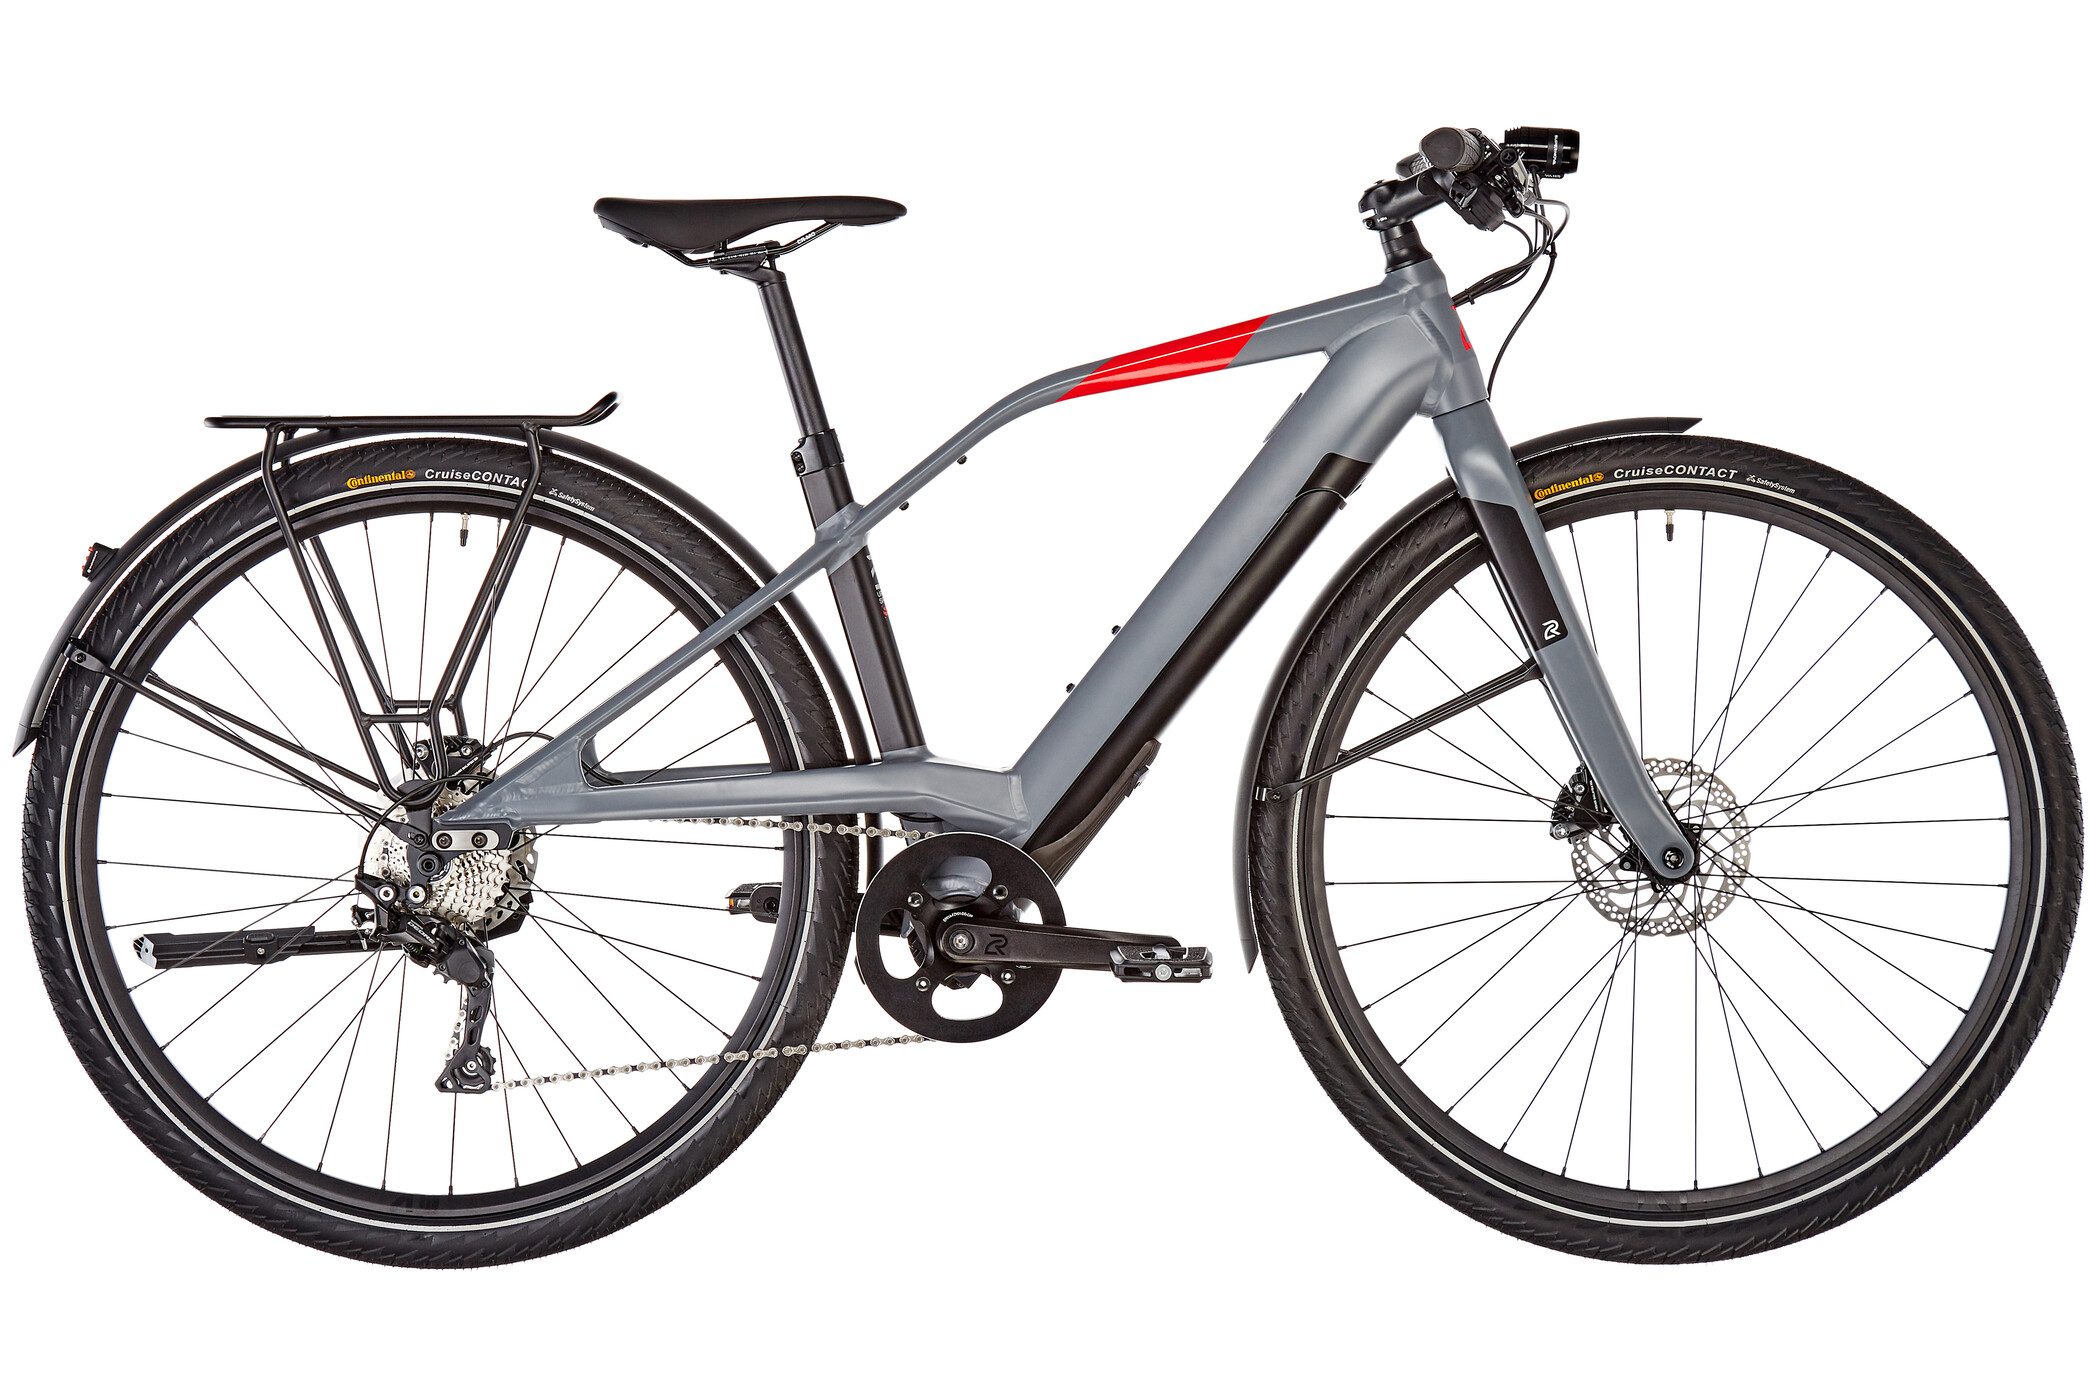 LOGO FS10 FAZUA E Bike dark greyblackred